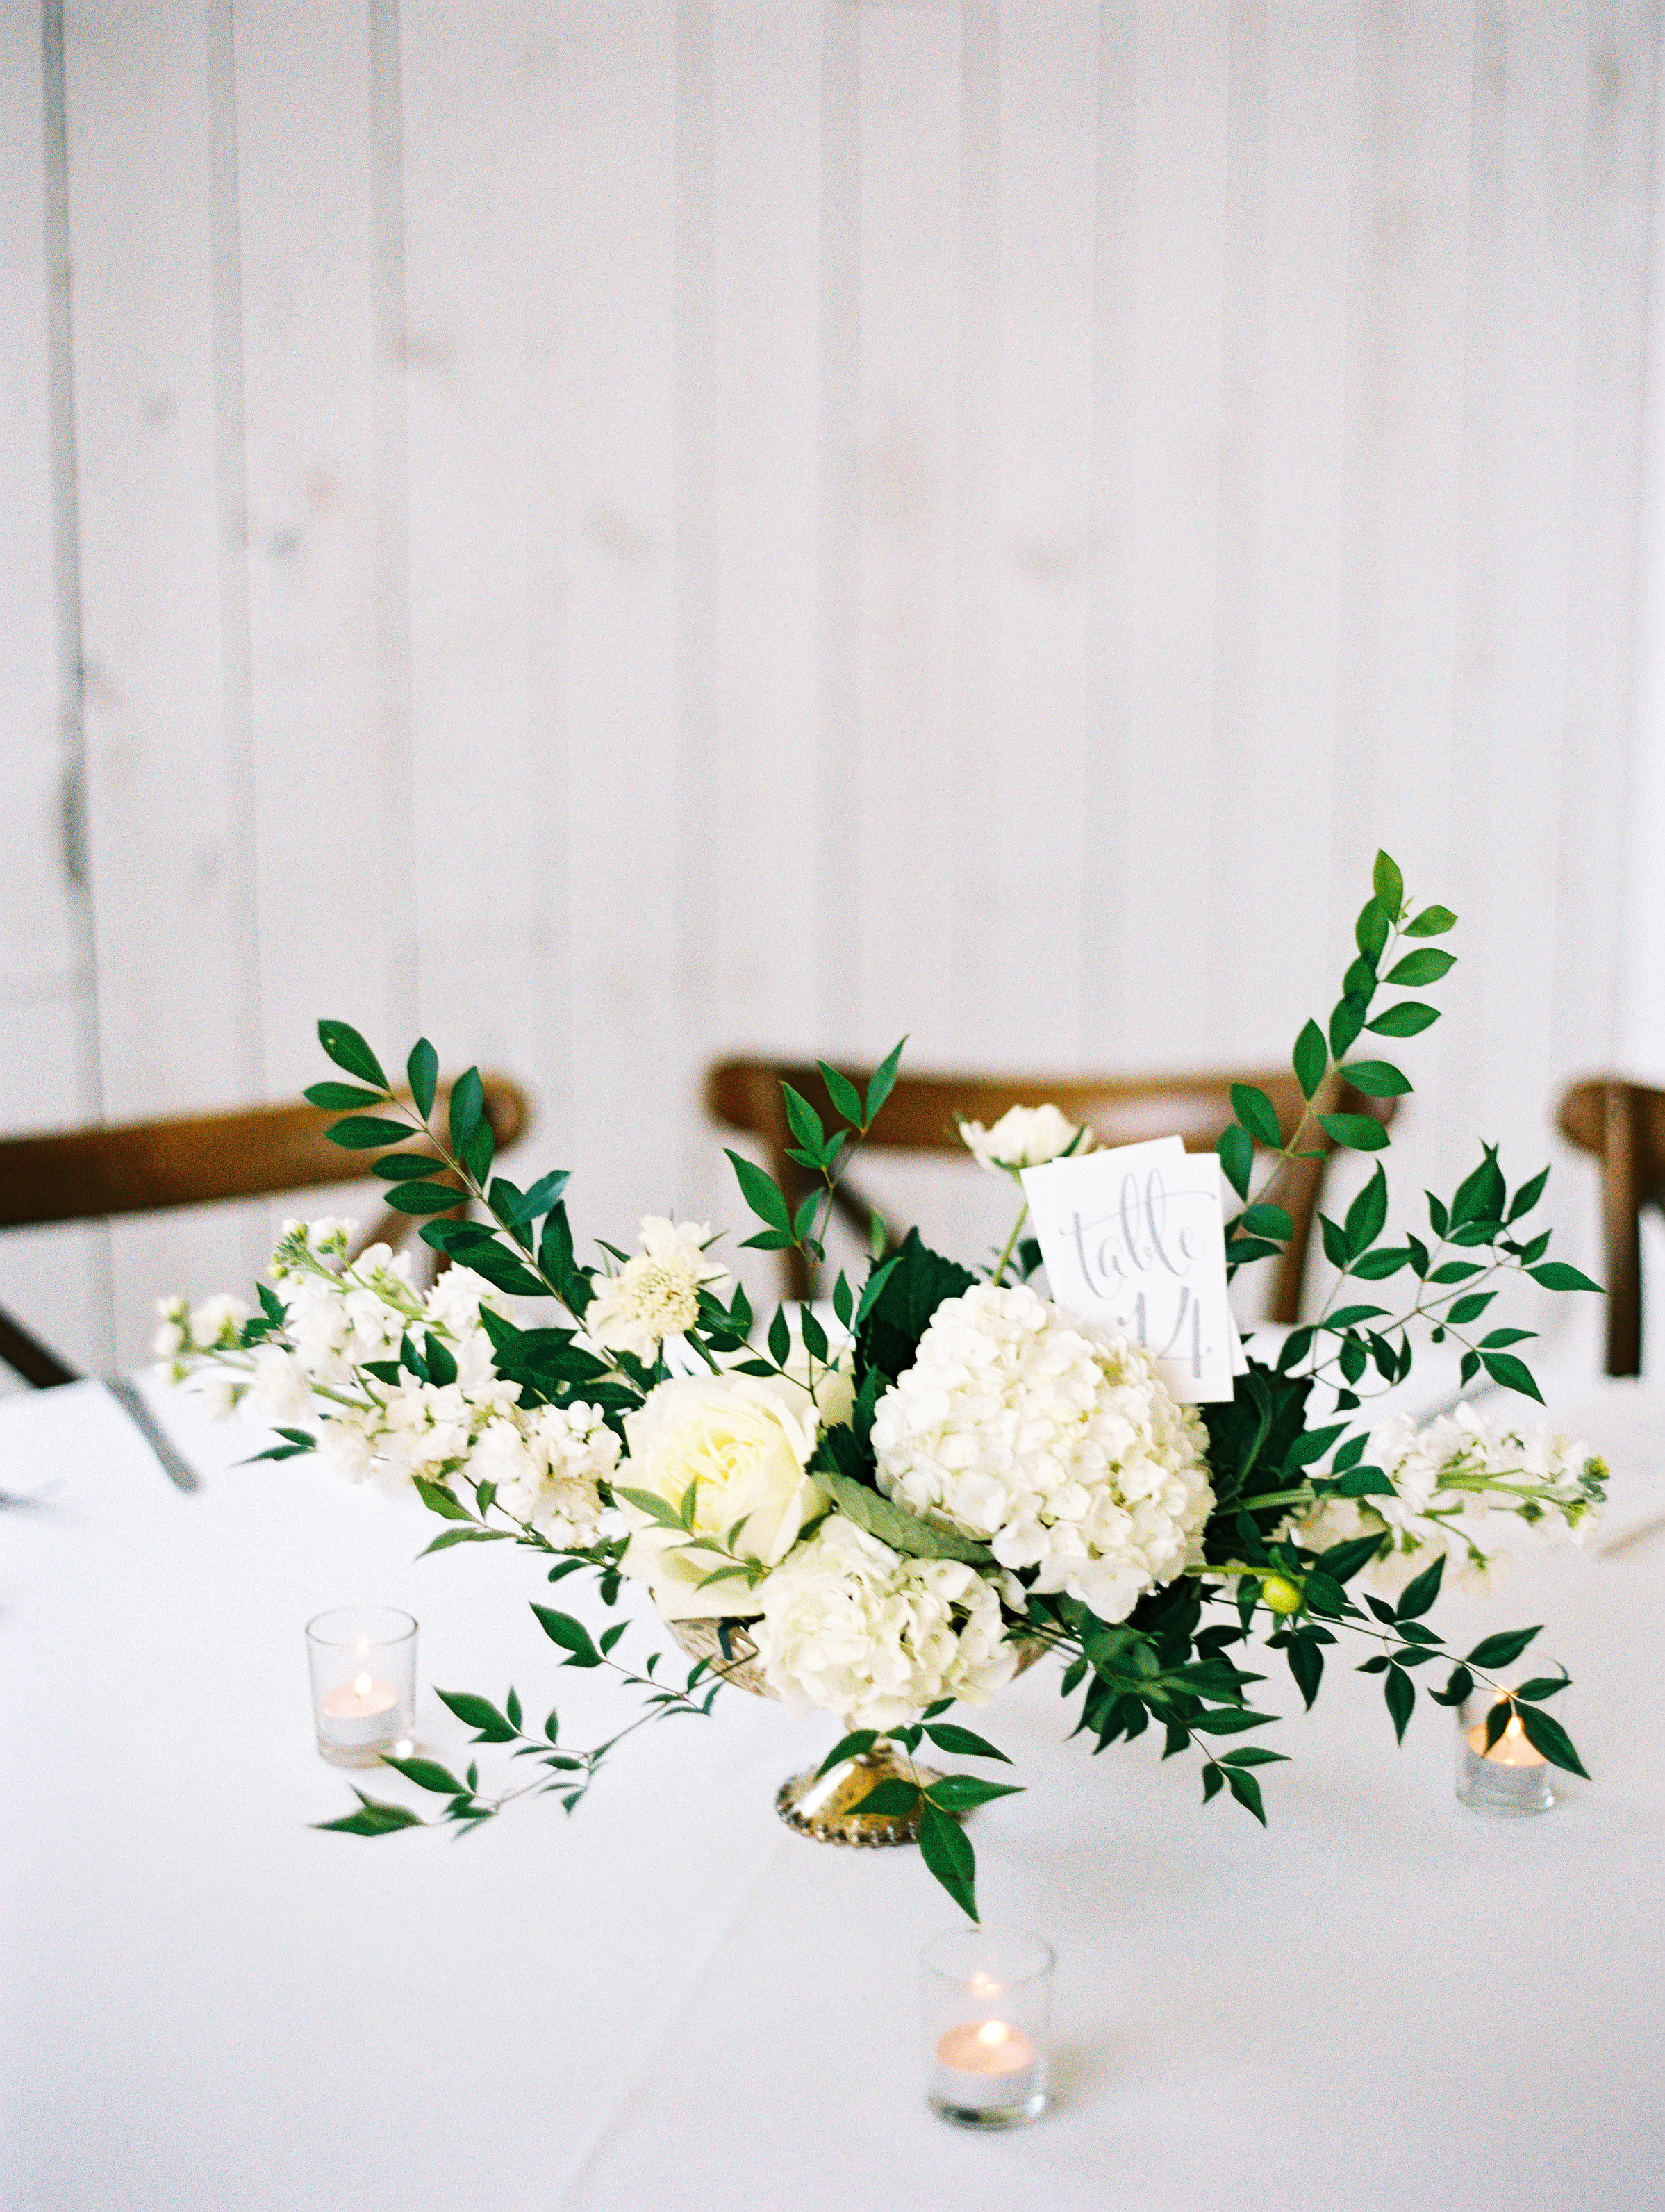 shakira travis wedding reception centerpieces flowers